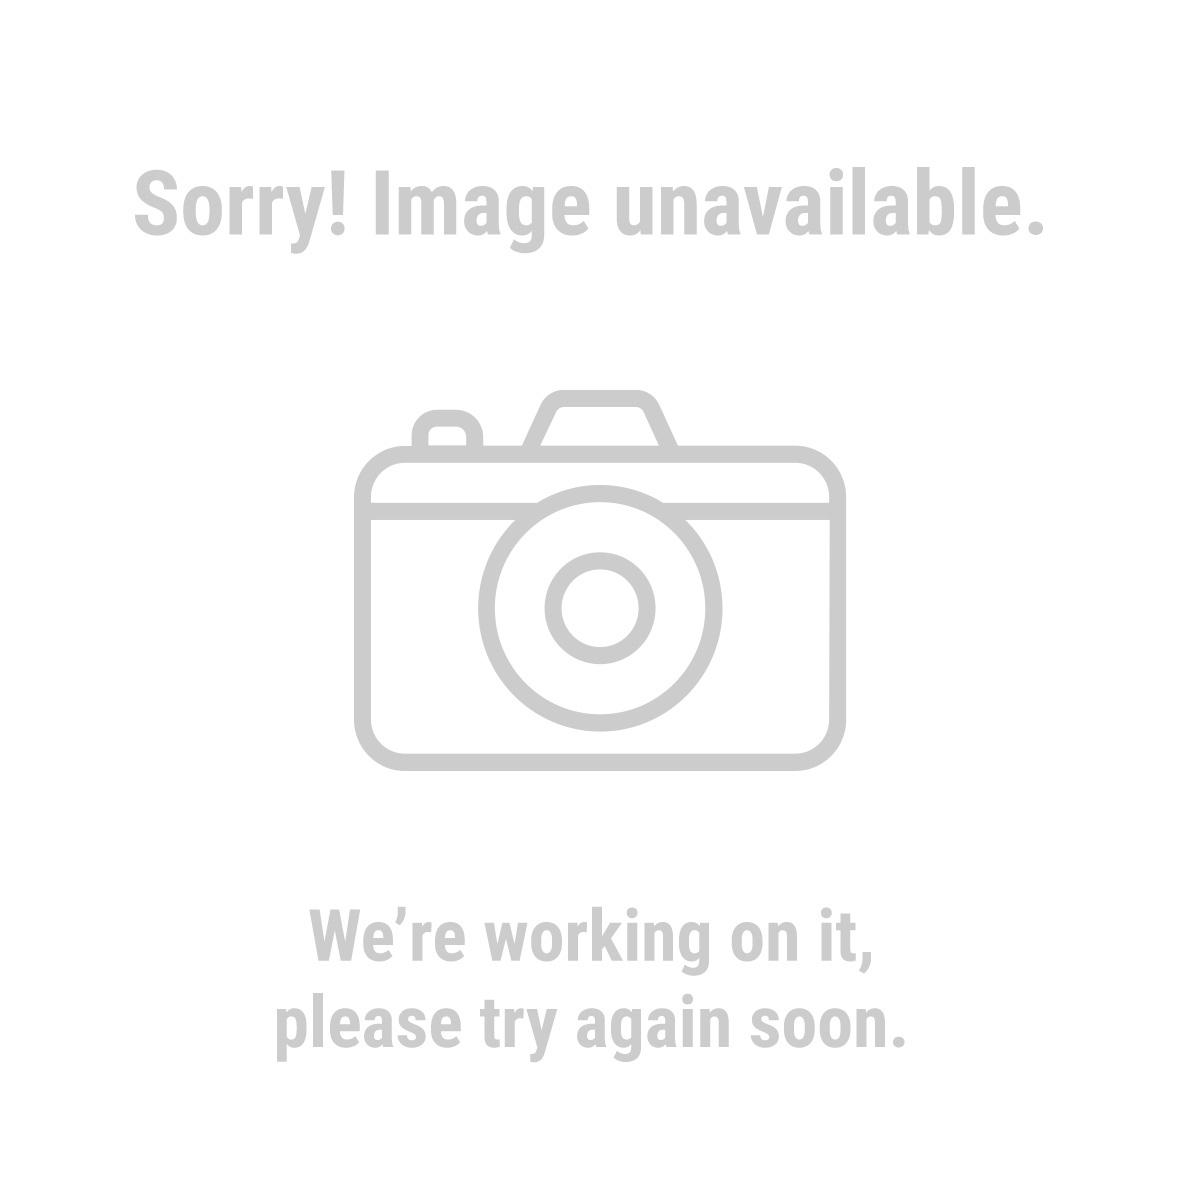 Central Hydraulics 33884 2200 lb. 2-Stage Transmission Jack